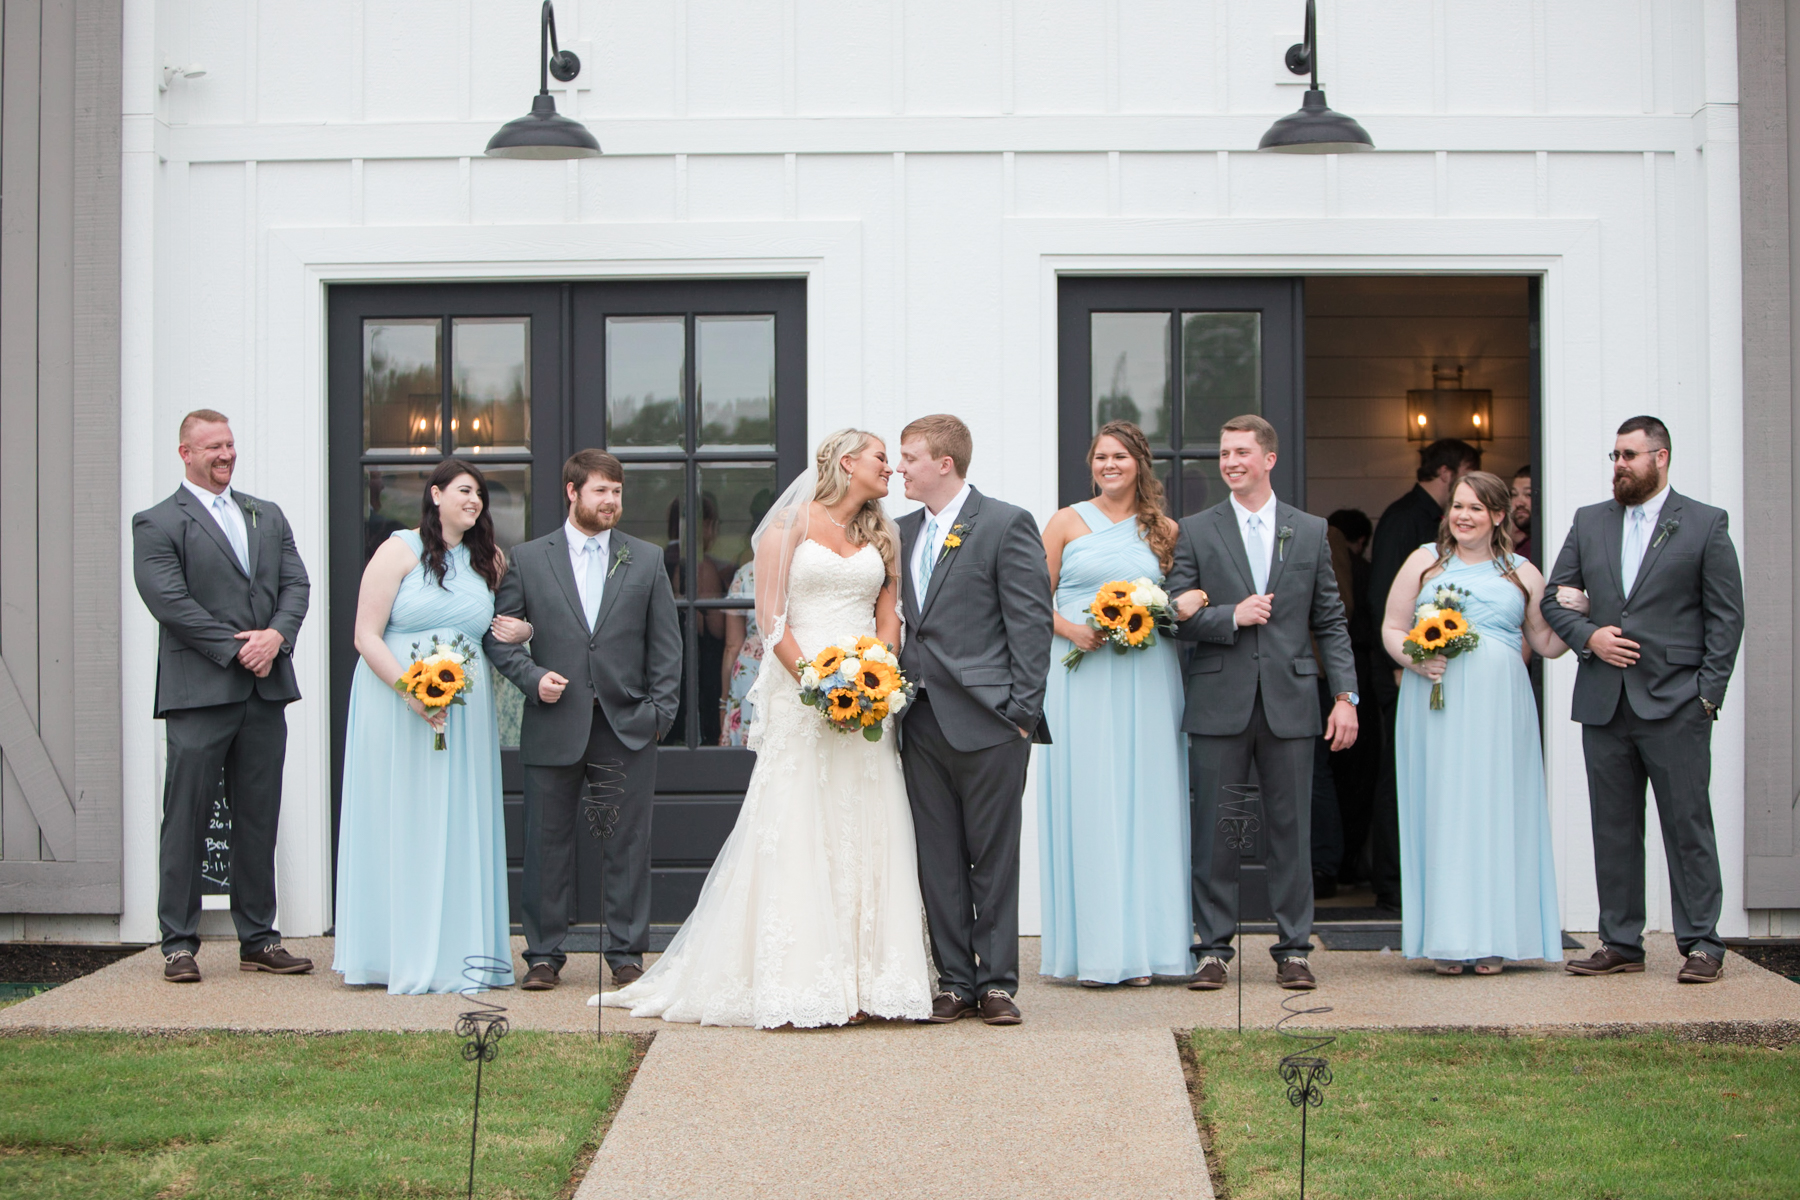 The-venue-at-white-oak-farms-wedding-nashville-wedding-photographers-0173.jpg